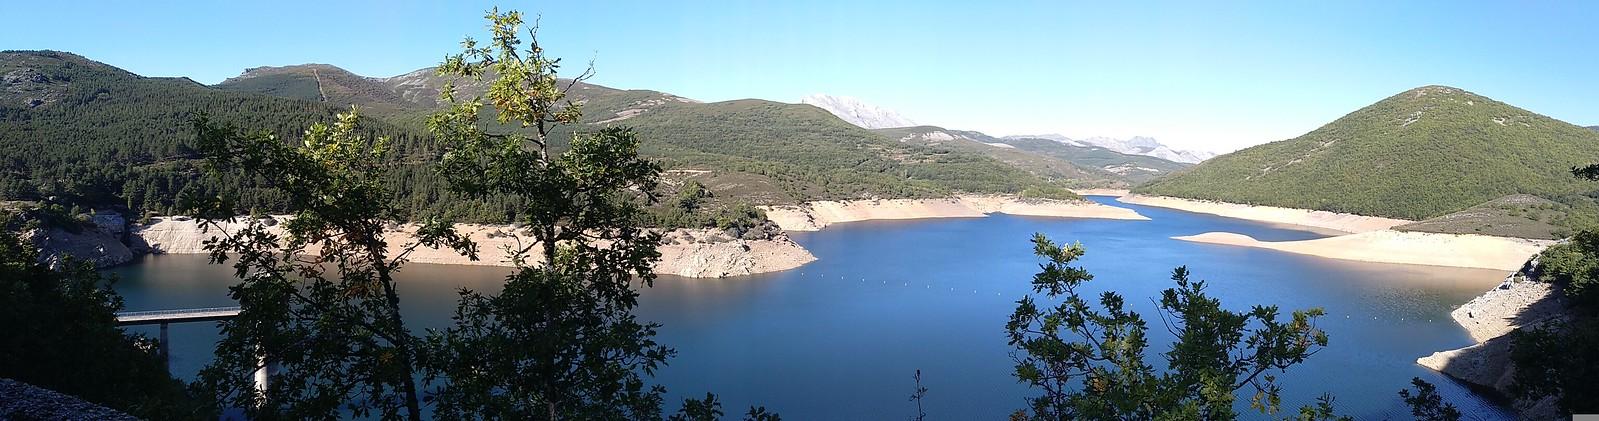 MARCHA-0567 Senderismo Ruta de Camporredondo a Valcovero Palencia